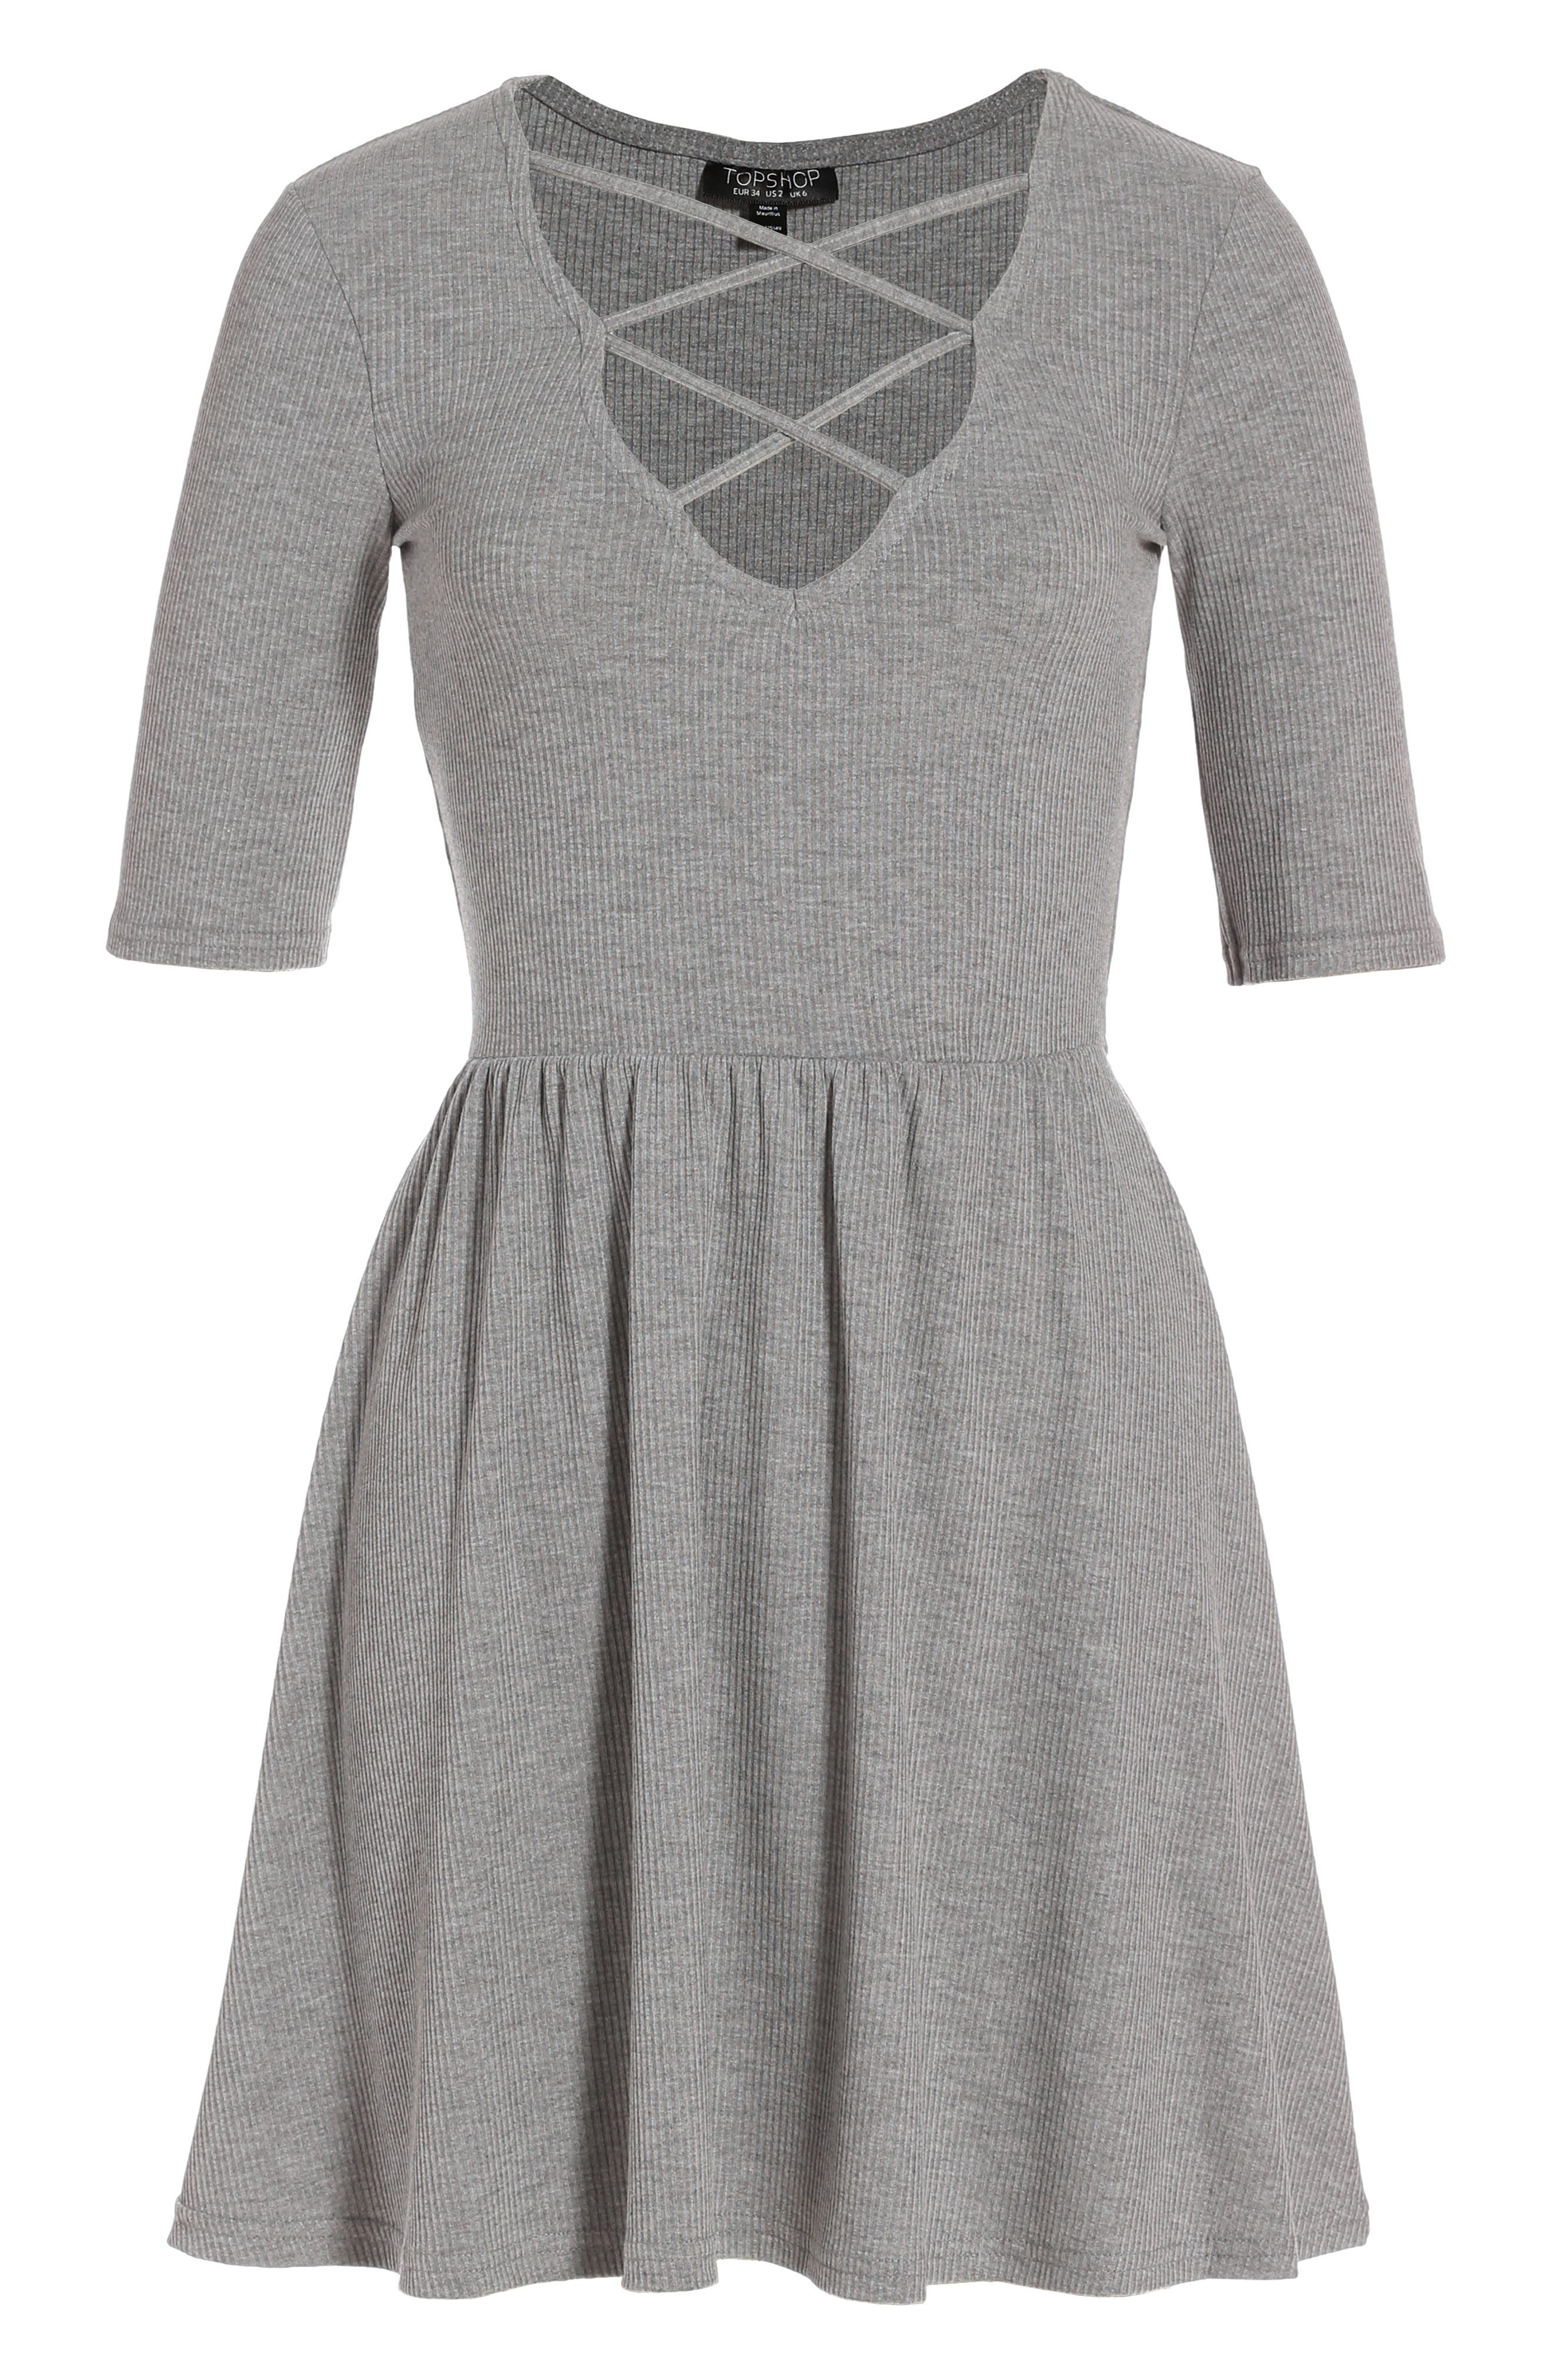 Topshop Lattice Skater Dress